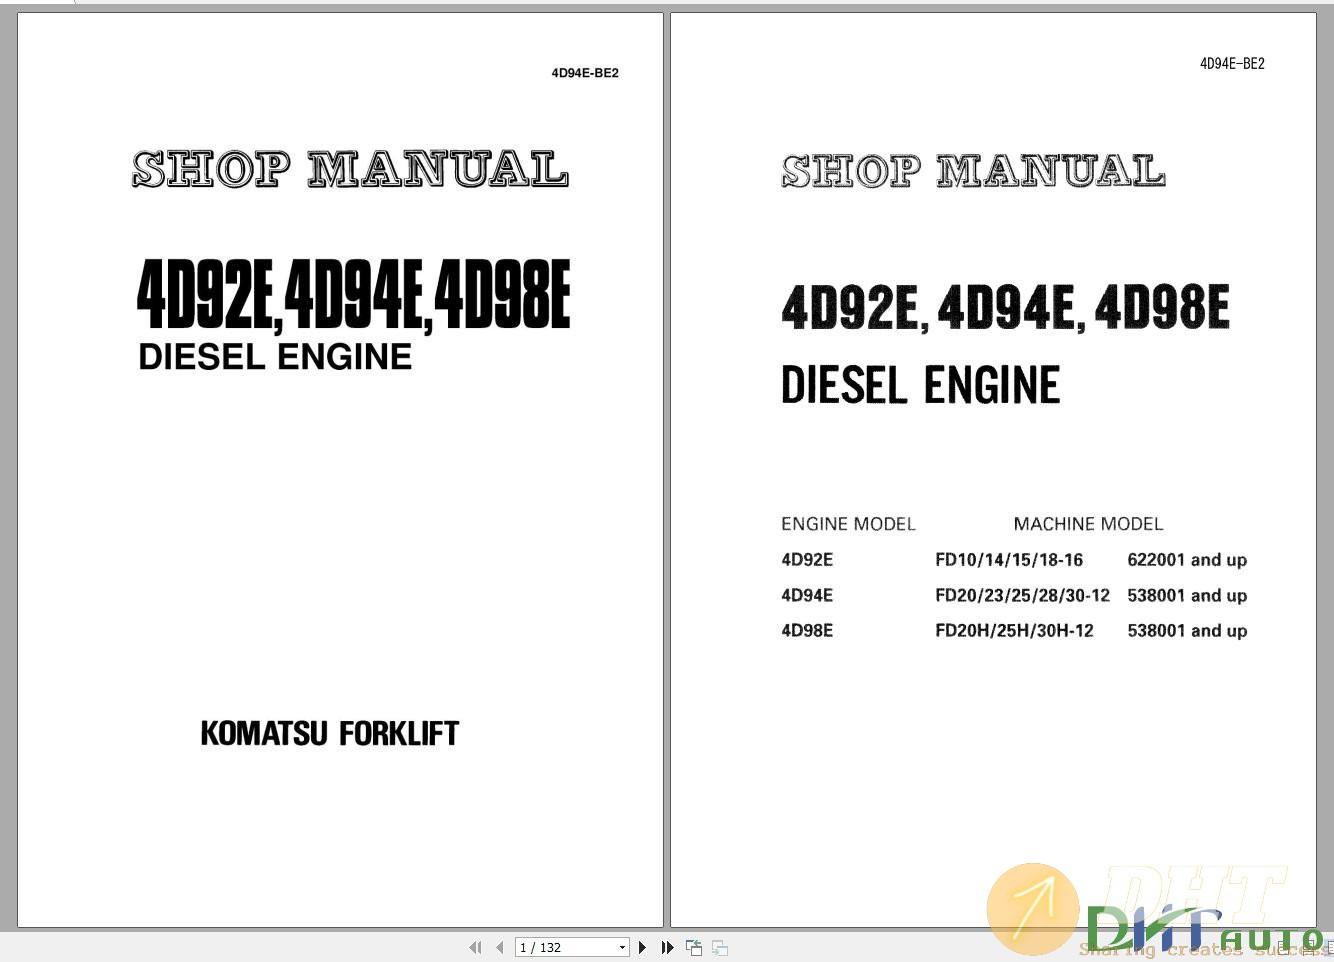 Komatsu-Forklift-Shop-Manual-PDF-Full-1.jpg